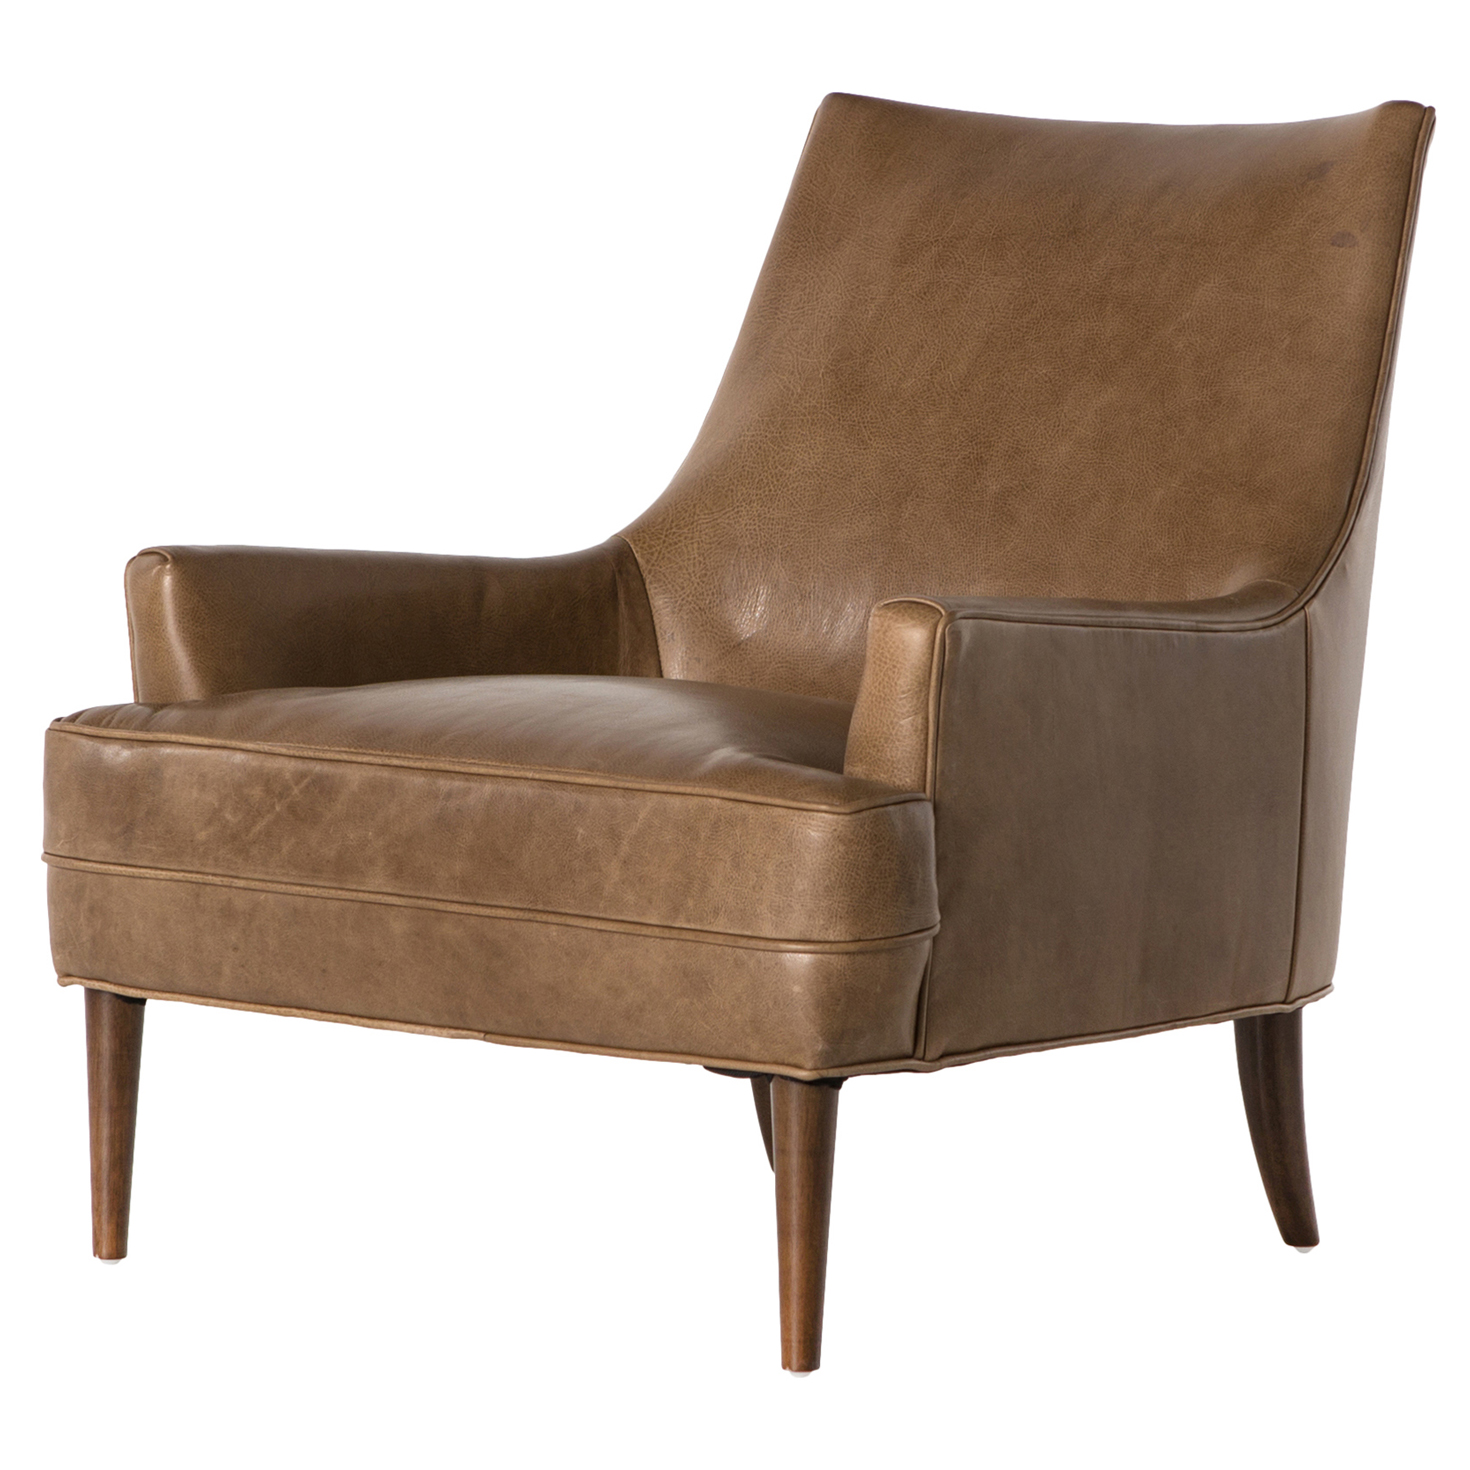 Vanda Retro Modern Camel Brown Leather Armchair